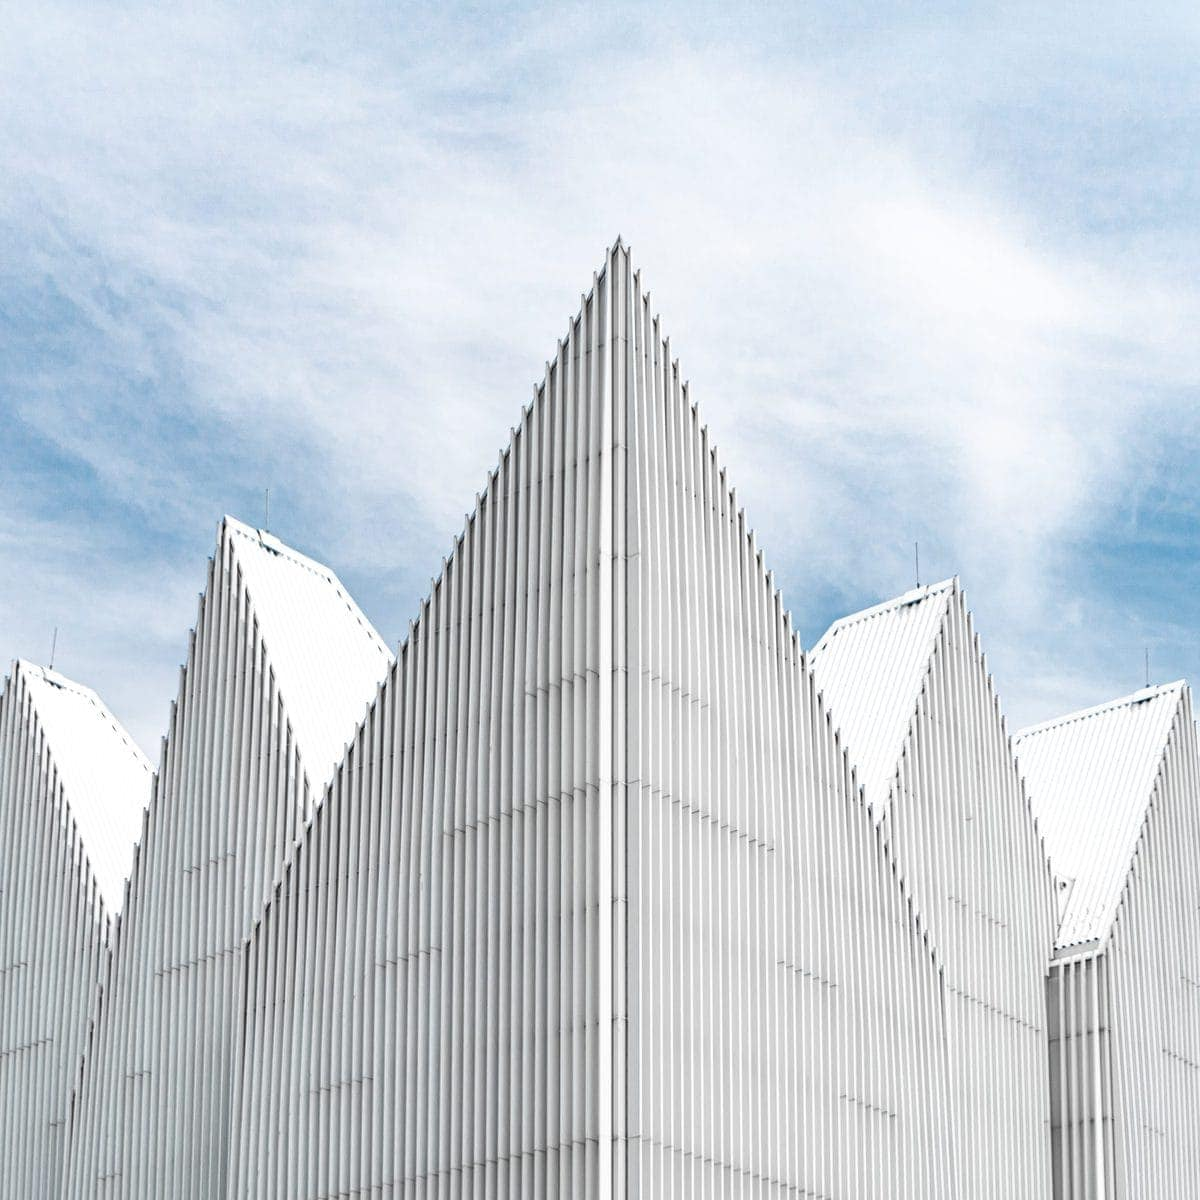 Philharmonic Hall Szczecin 4, 2019